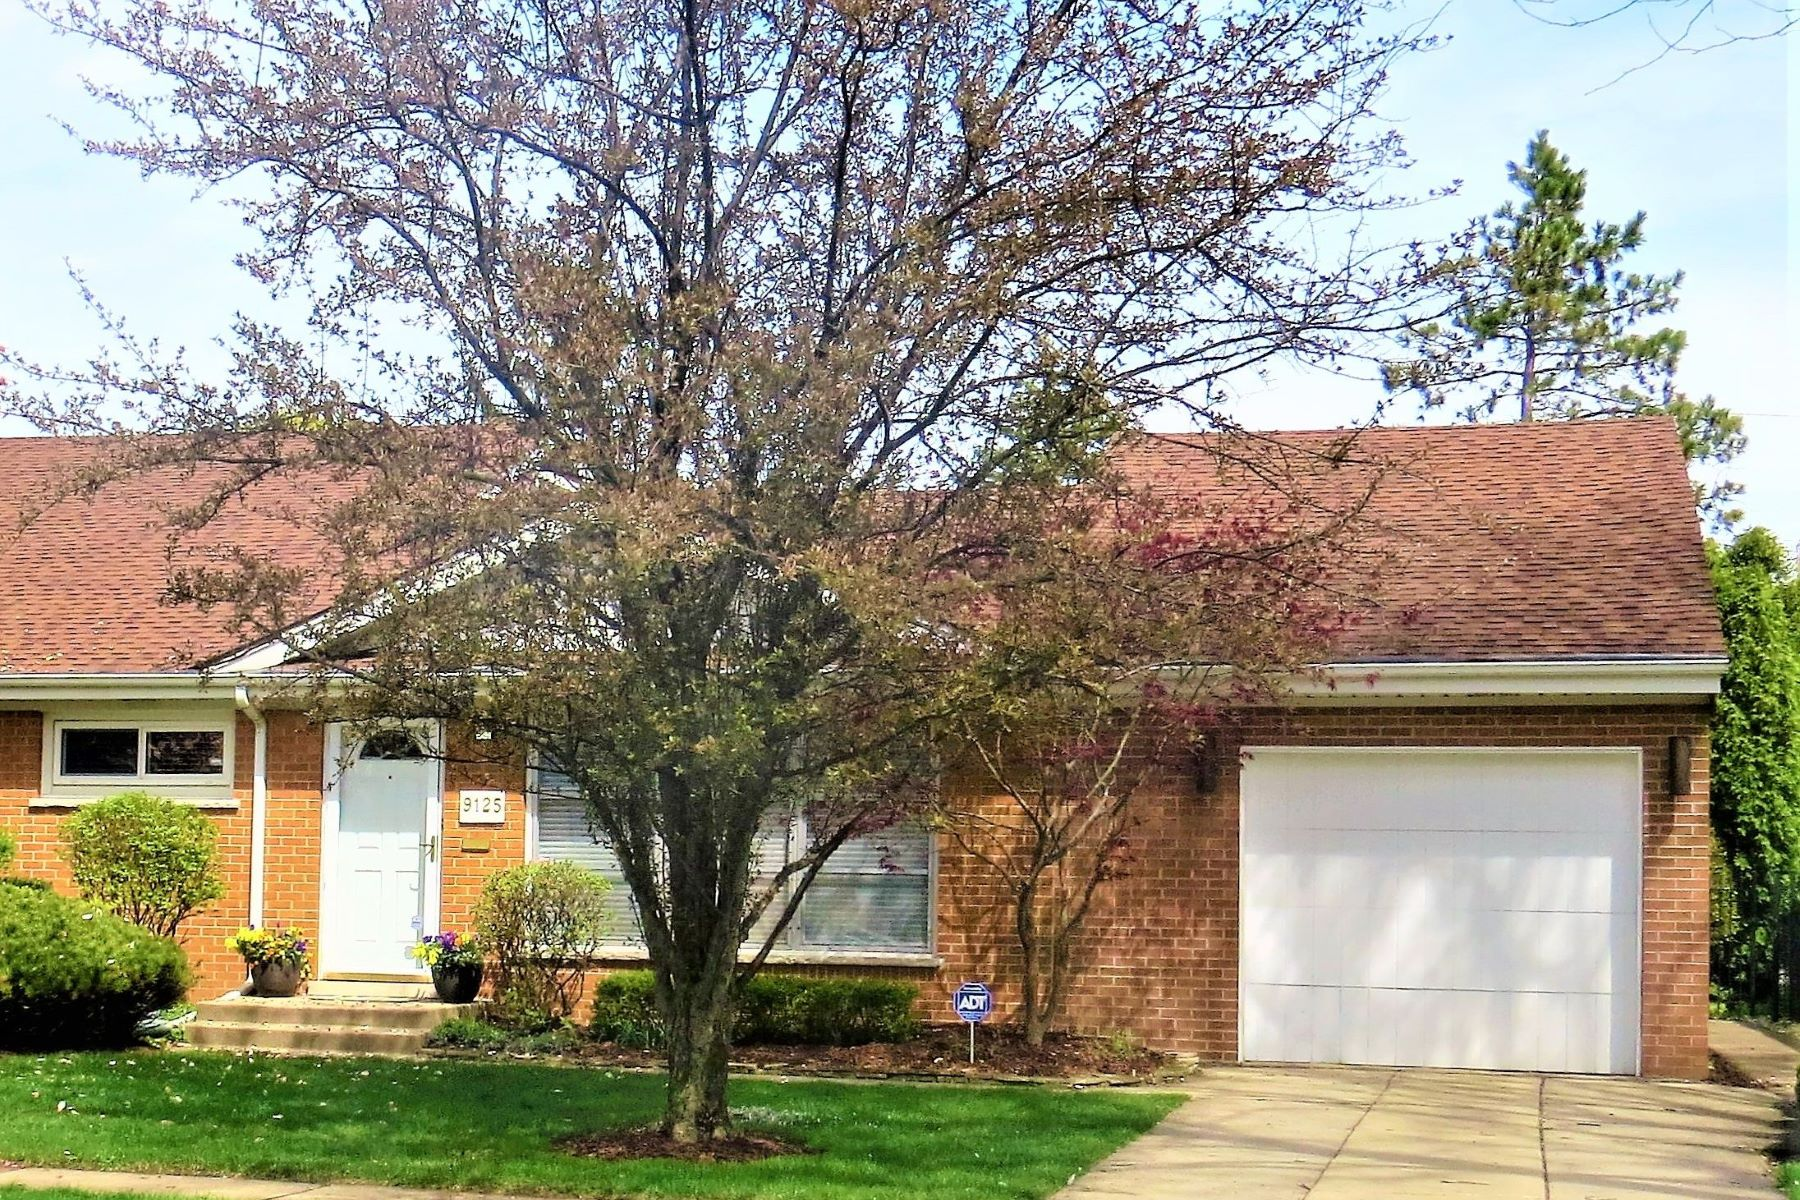 Single Family Home for Active at Amazing Move-In Ready Home 9125 Mango Avenue Morton Grove, Illinois 60053 United States